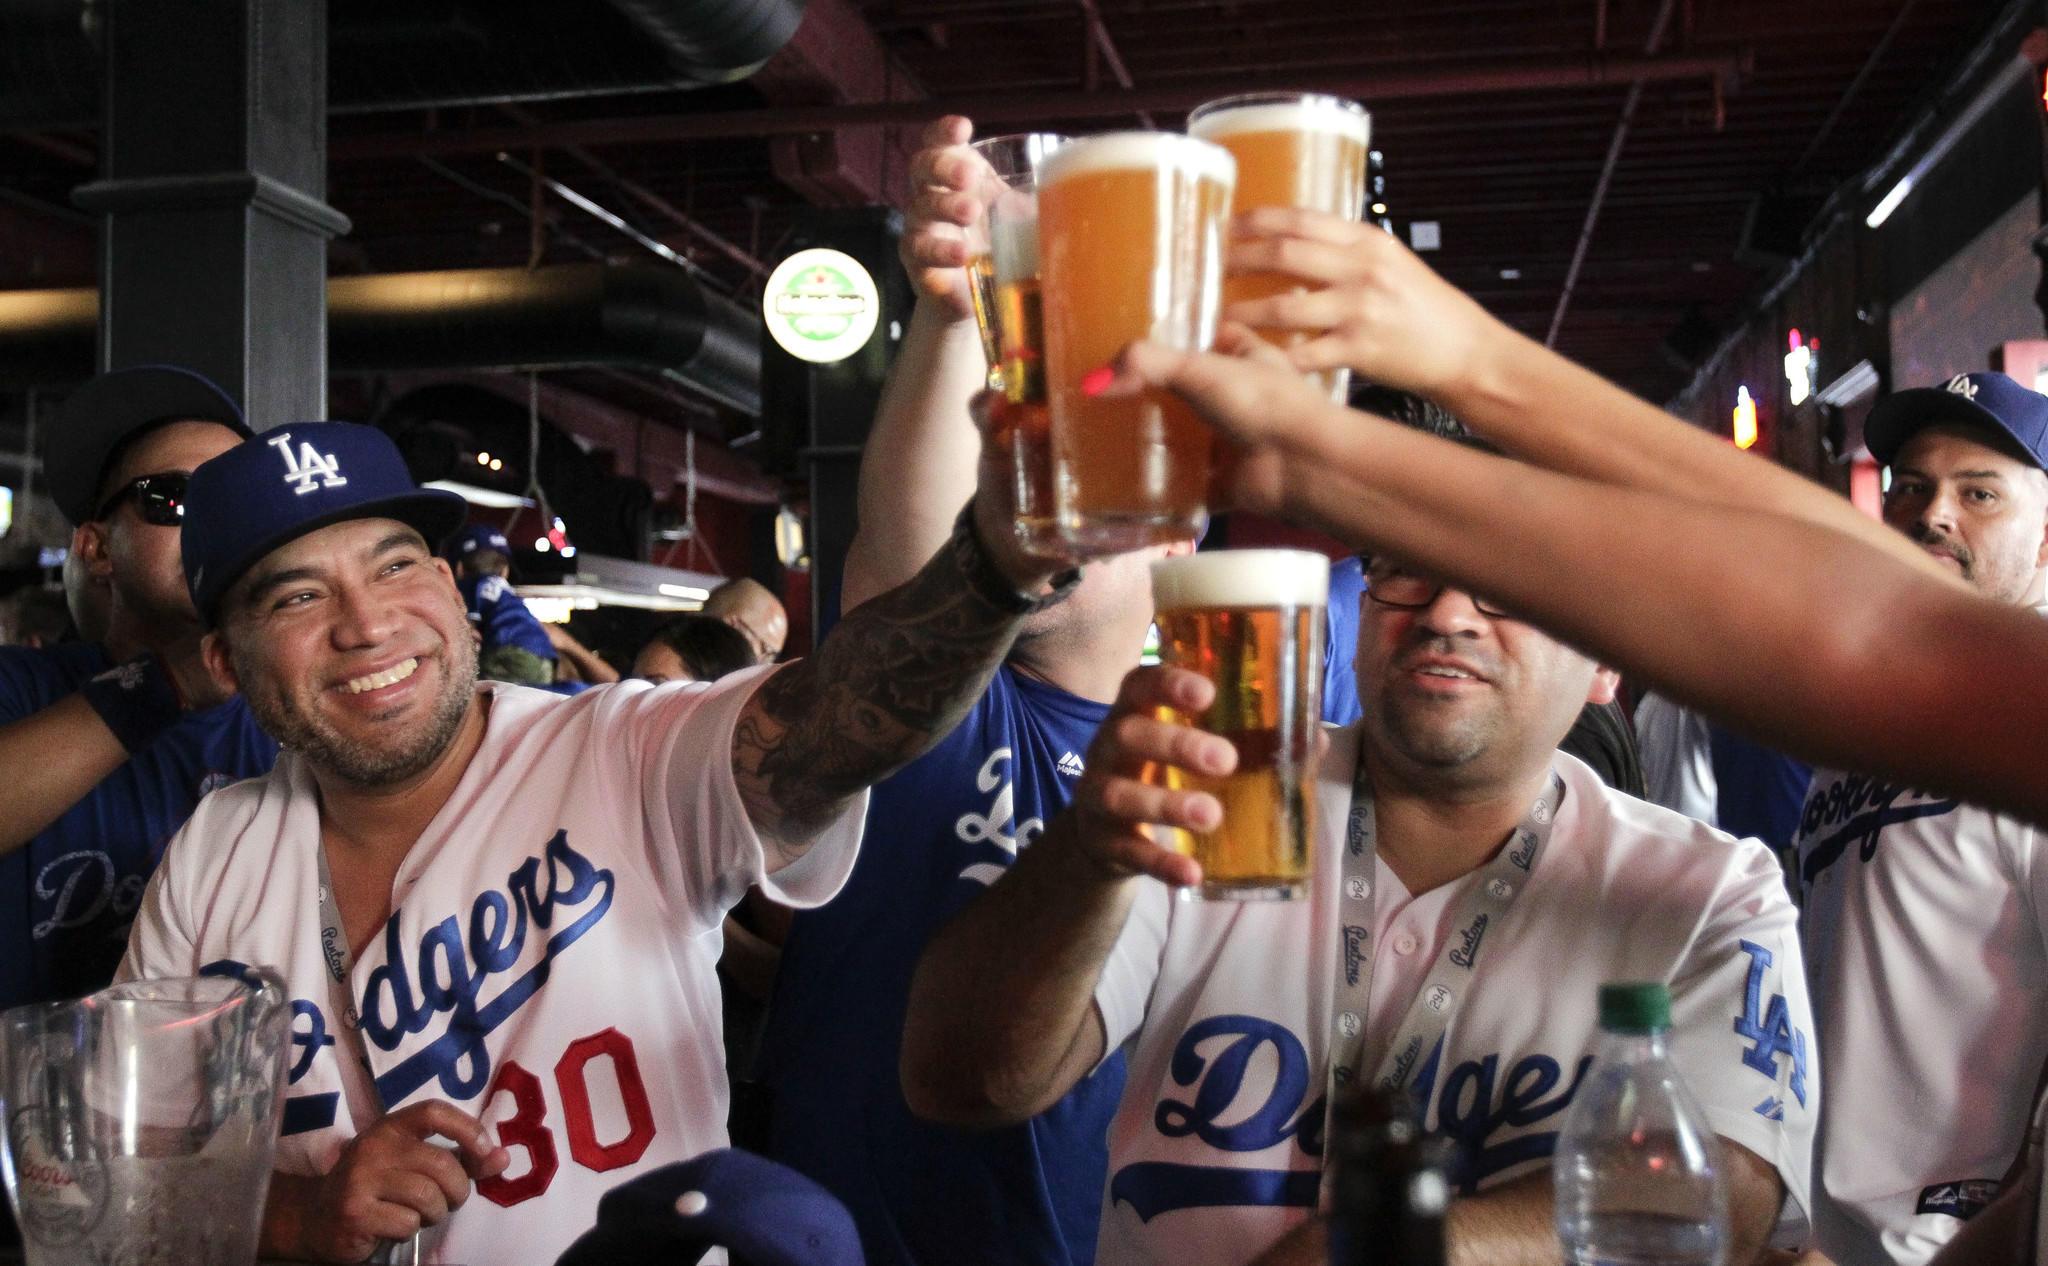 happy baseball fans